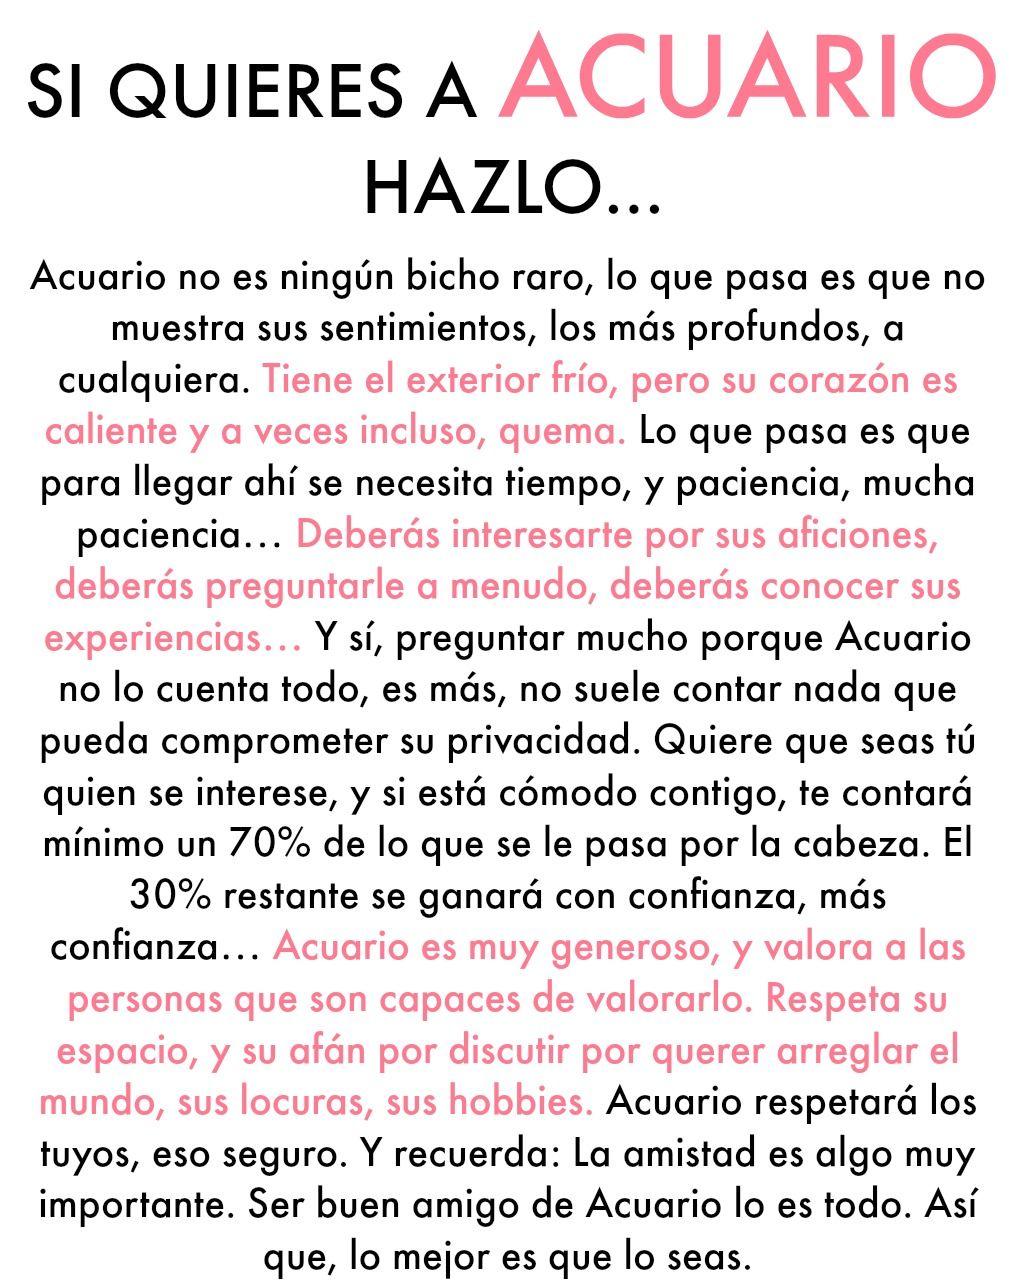 Caracteristicas del signo acuario hombre en el amor [PUNIQRANDLINE-(au-dating-names.txt) 55